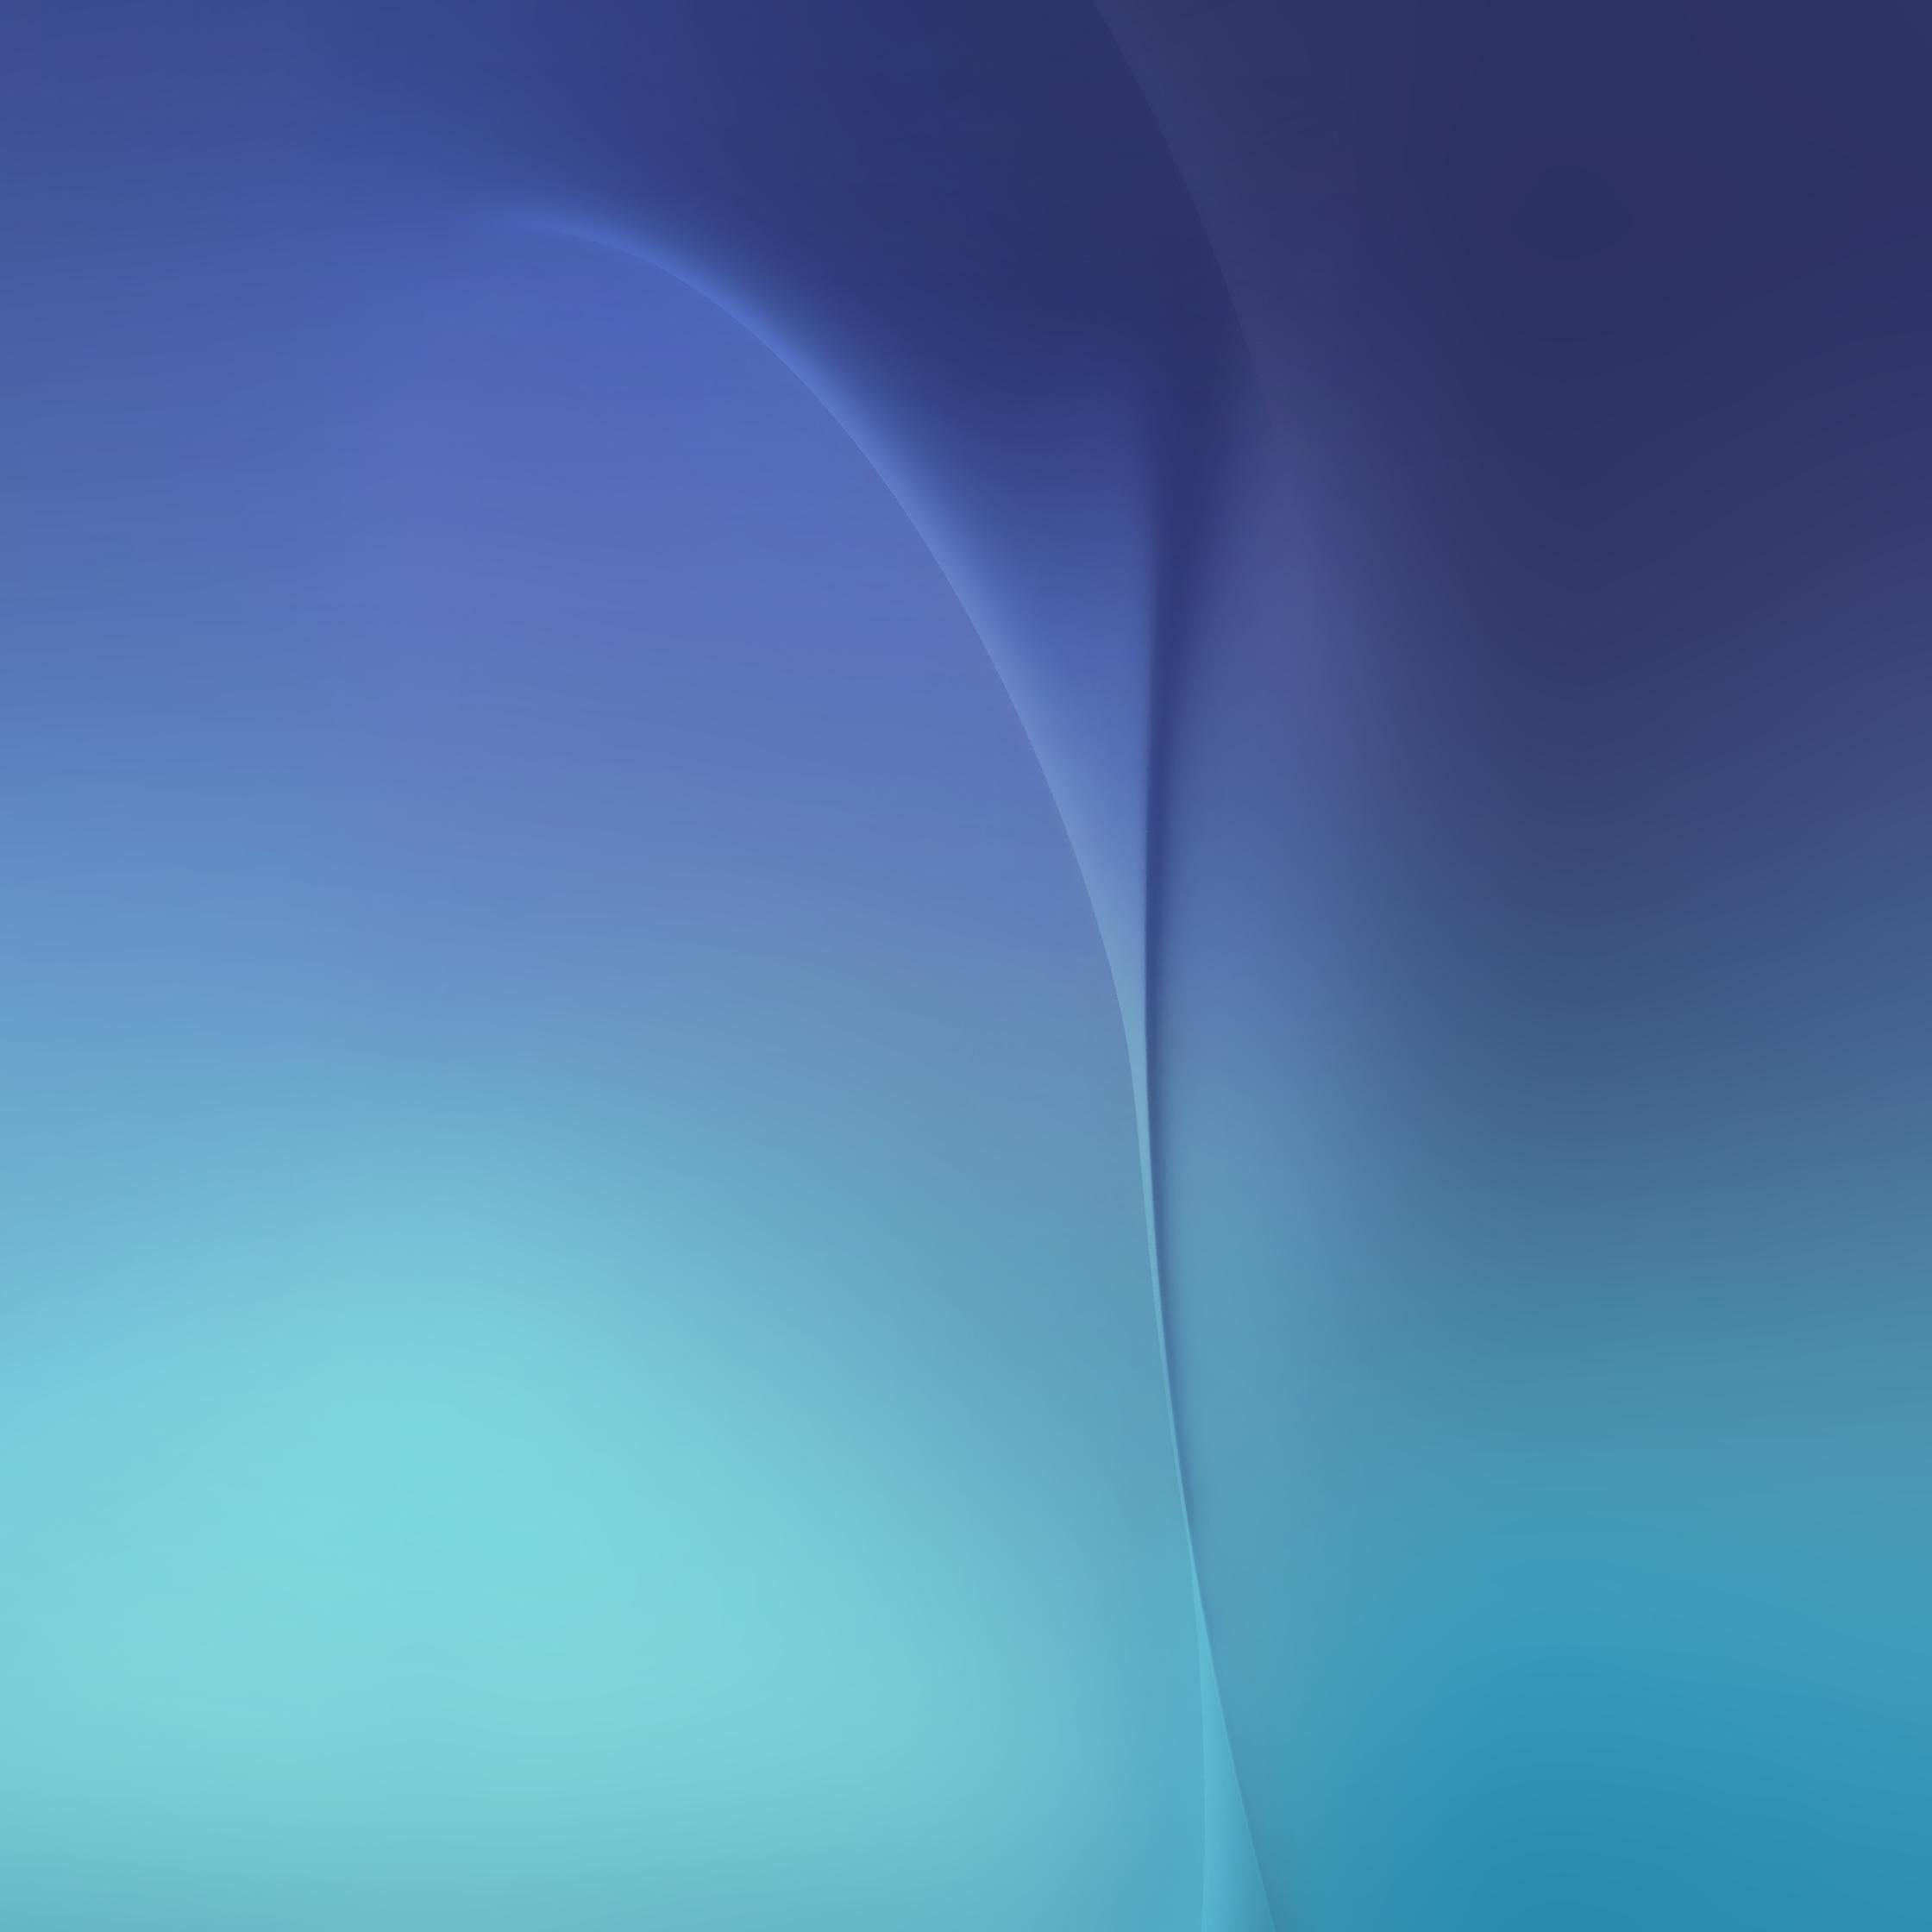 45 Galaxy S6 Edge Plus Wallpaper On Wallpapersafari